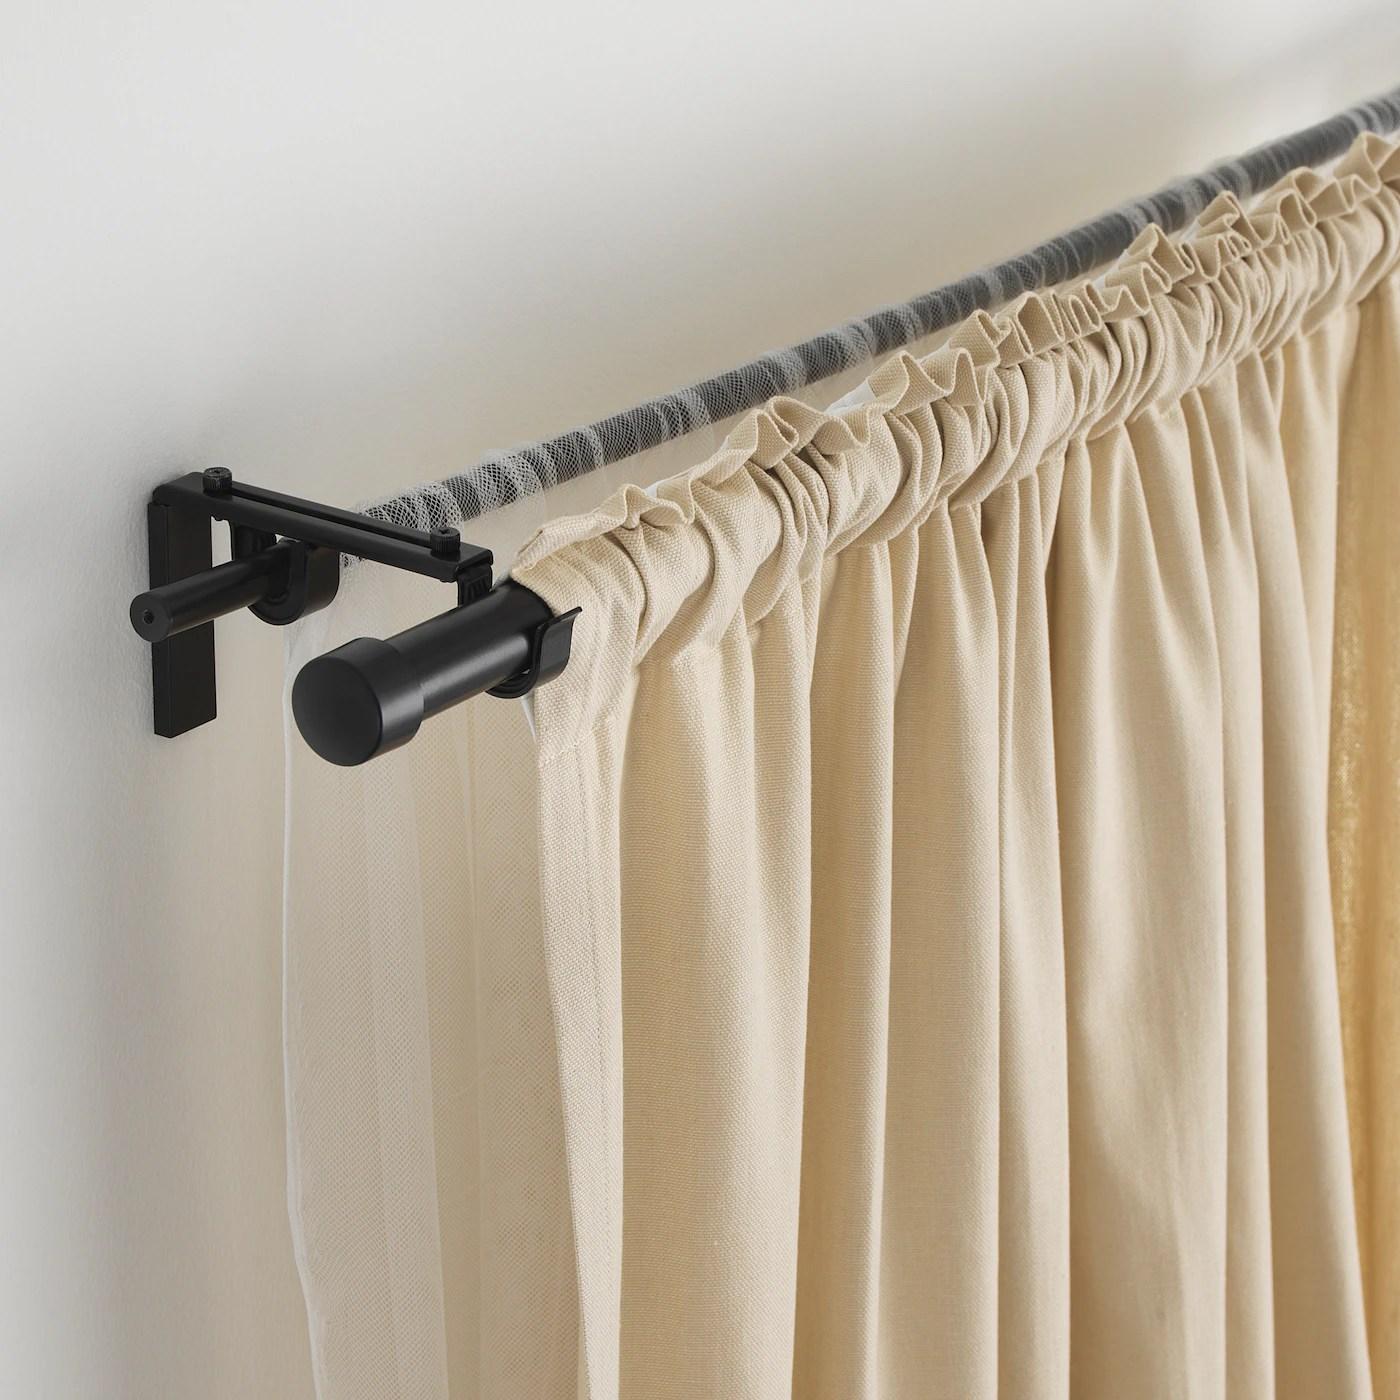 hugad tringle a rideau noir 210 385 cm